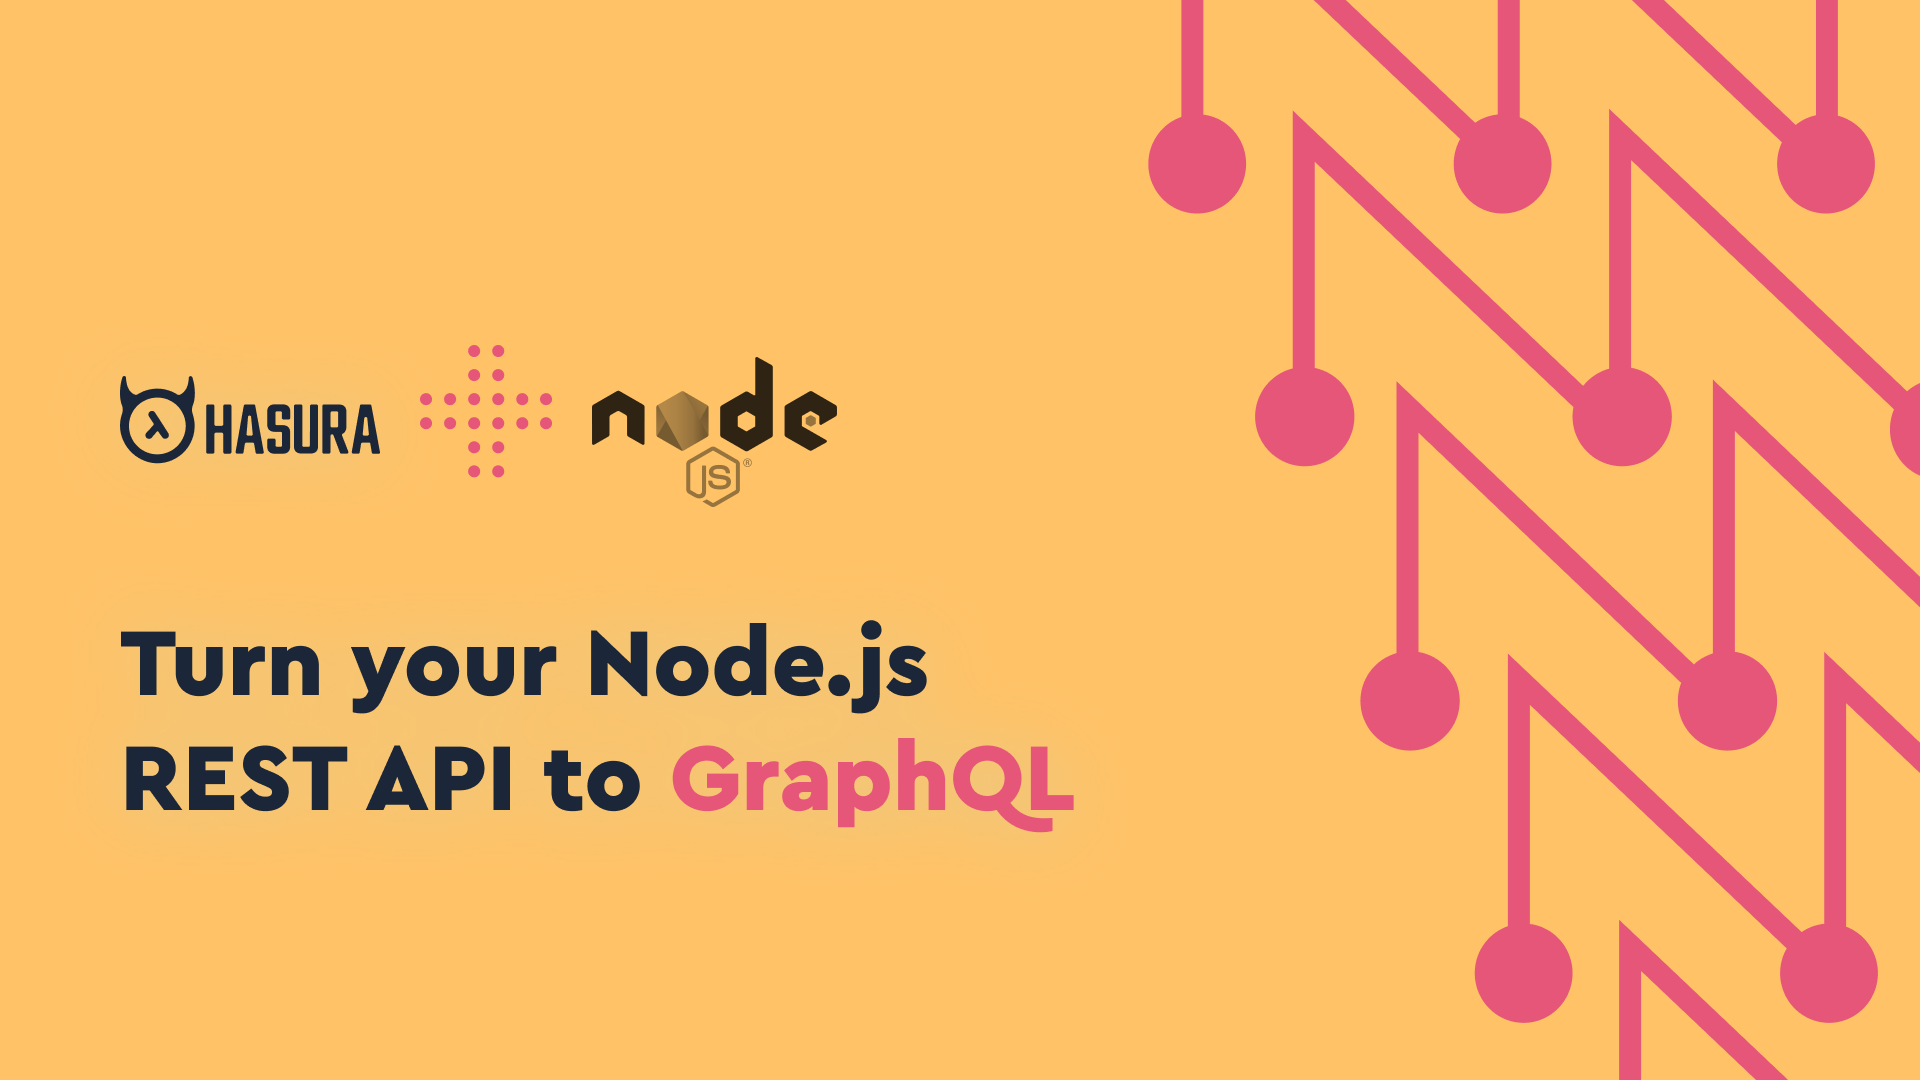 Turn your Node.js REST API to GraphQL using Hasura Actions